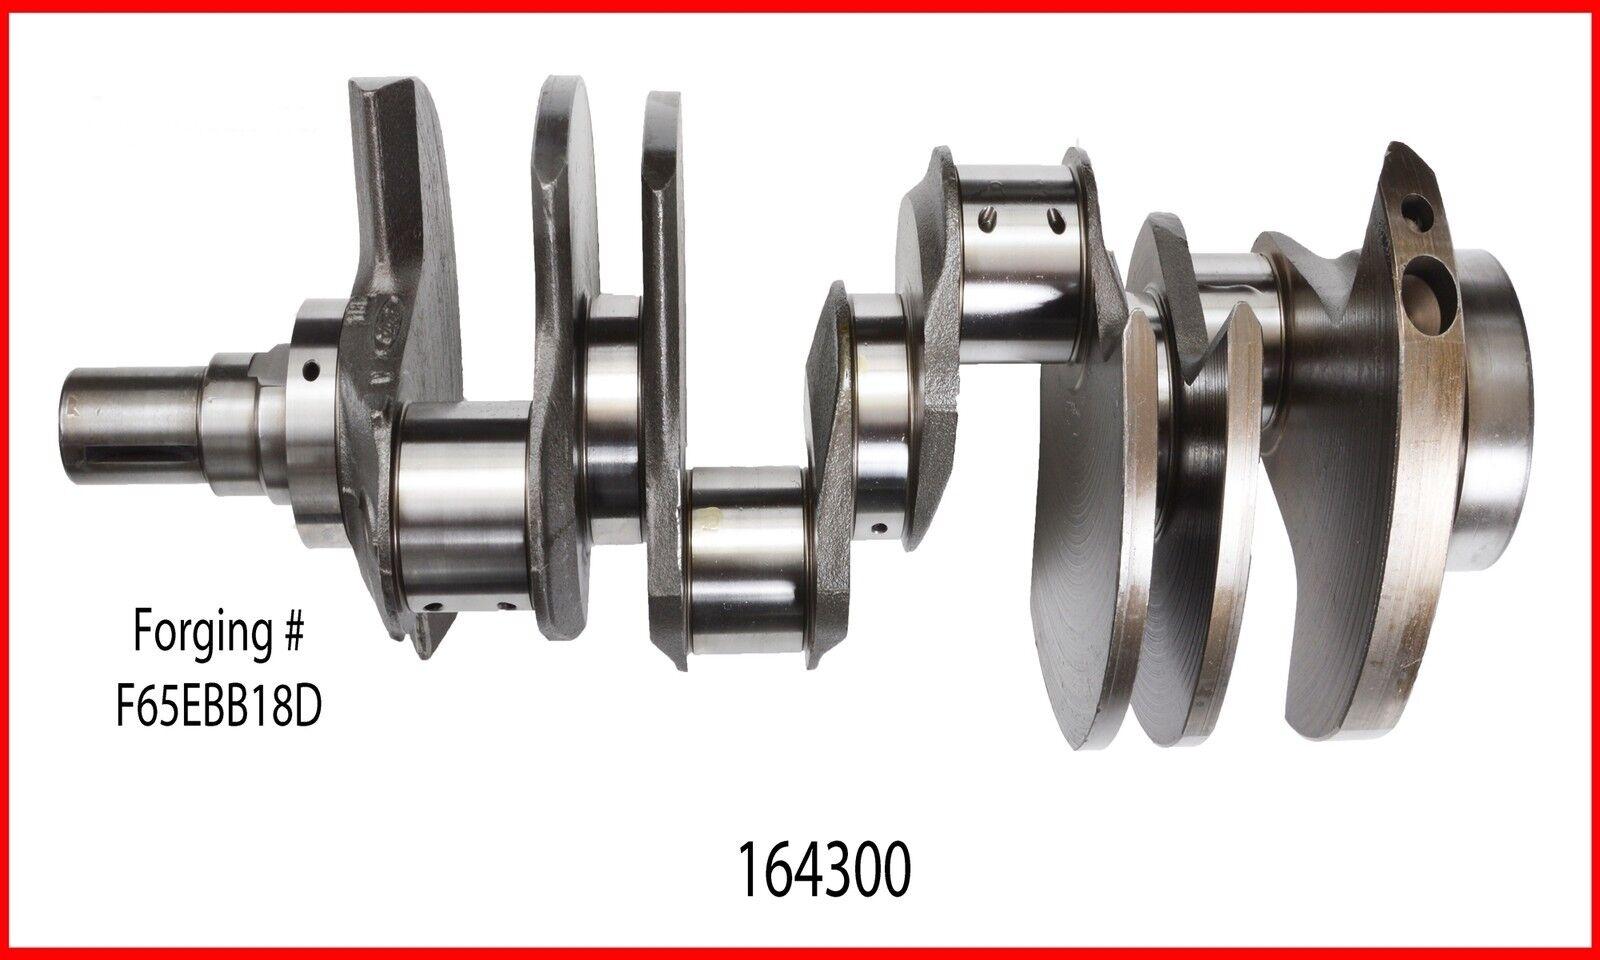 CRANKSHAFT W// BEARINGS Fits 1965-1996 FORD 300 4.9L OHV STRAIGHT-6